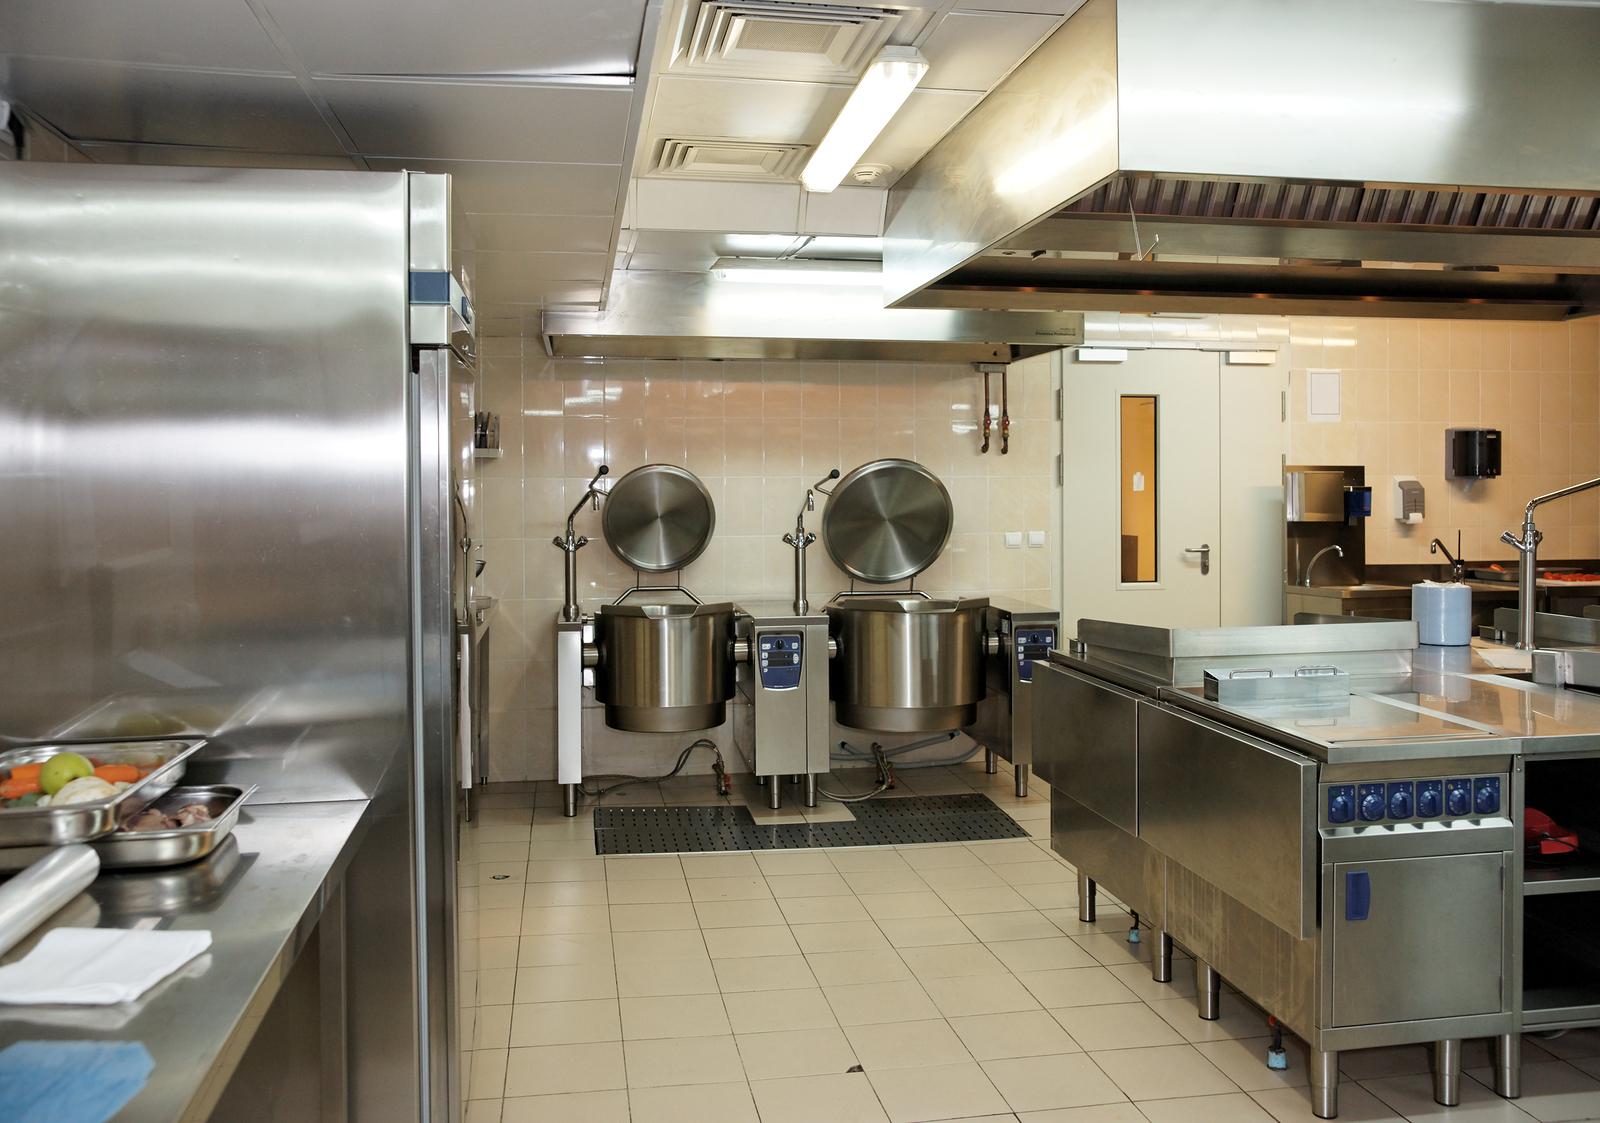 Kitchen Vent Hood Repair